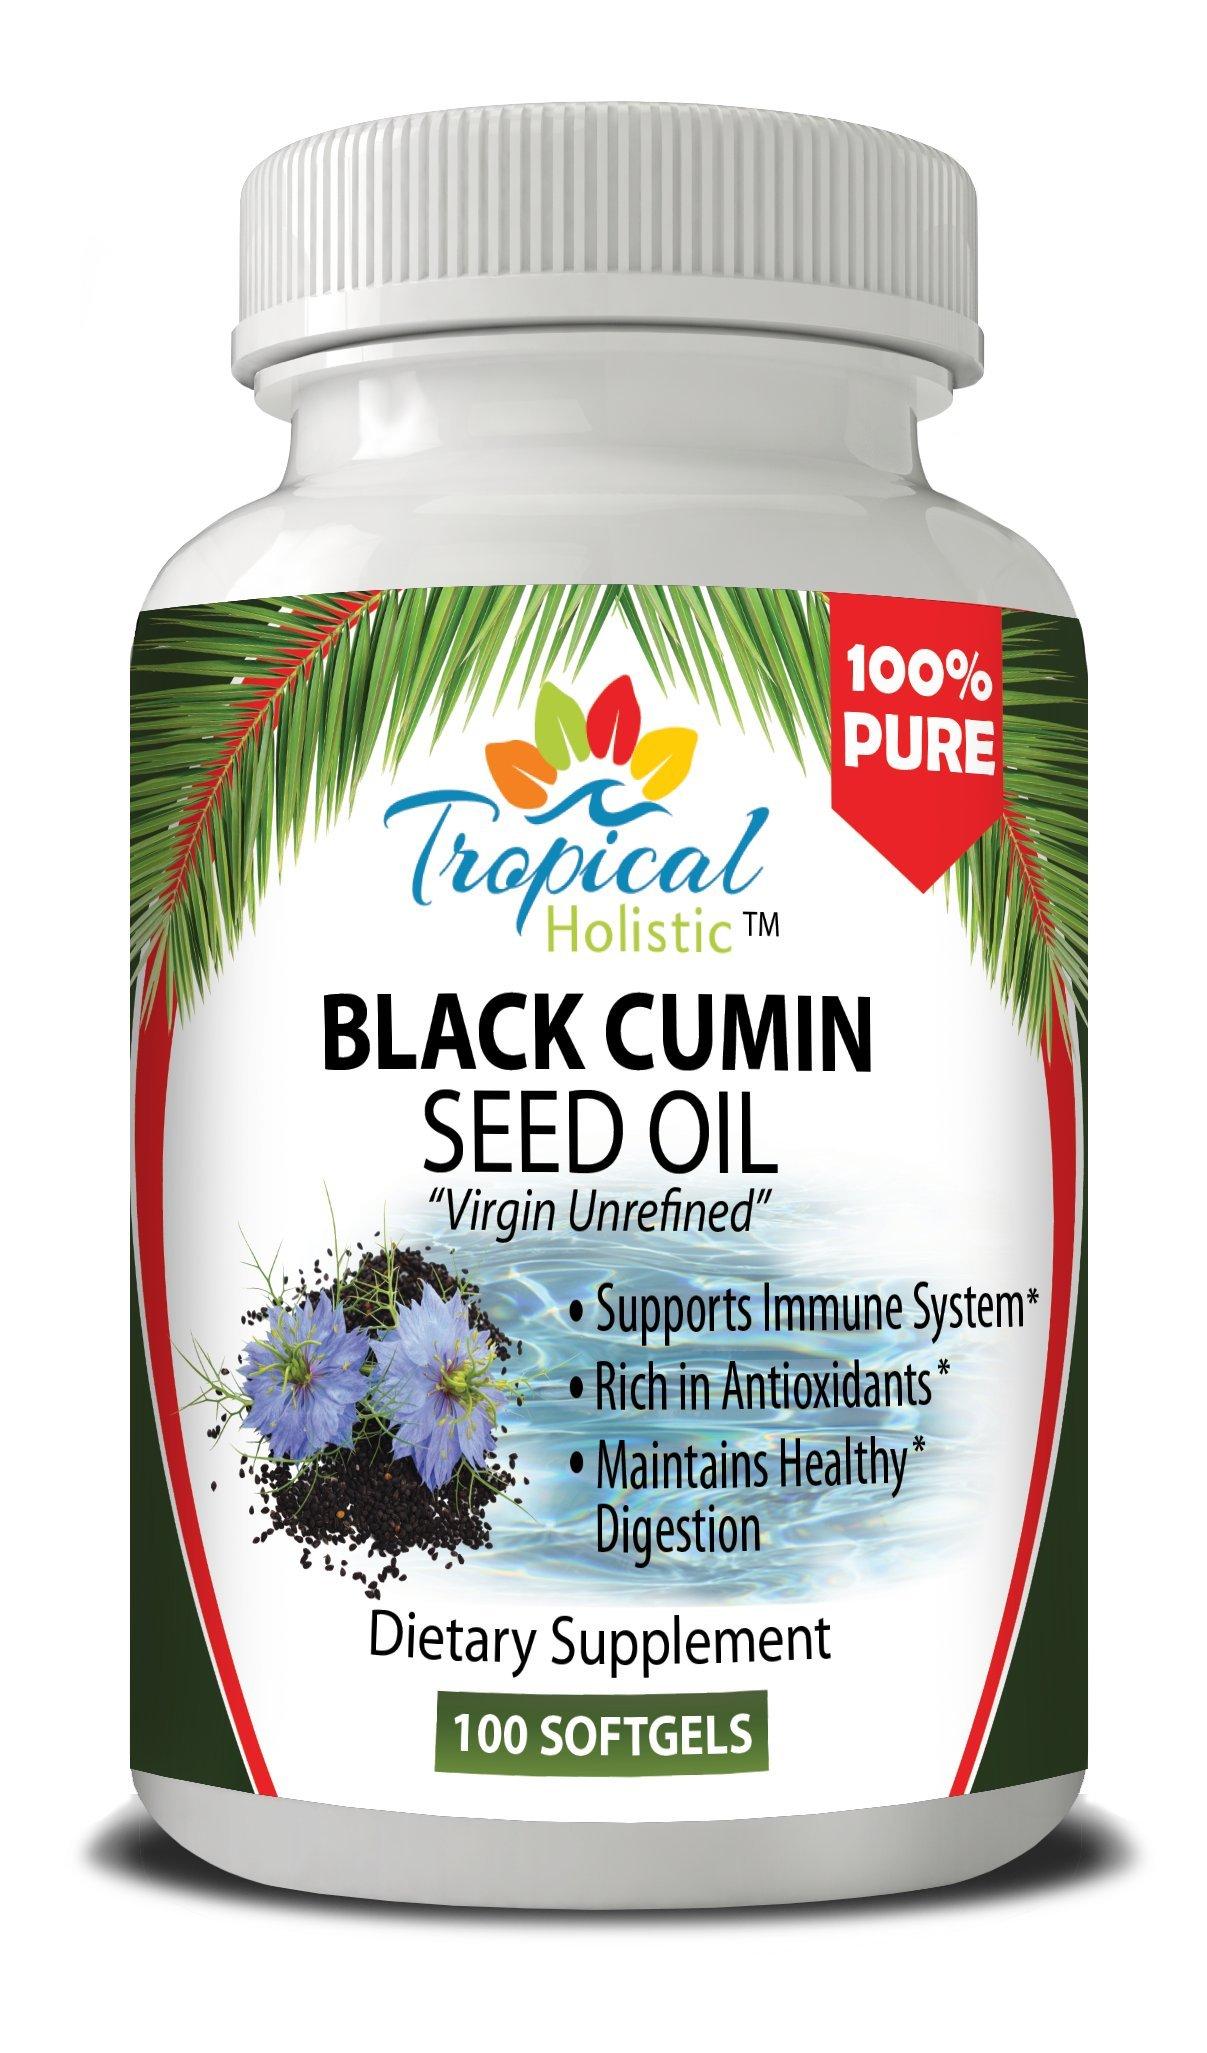 Premium Black Cumin Seed Oil SoftGel Capsules, 100 Count, (1000mg per Serving) - 100% Pure Unrefined Virgin Cold Pressed - Tropical Holistic